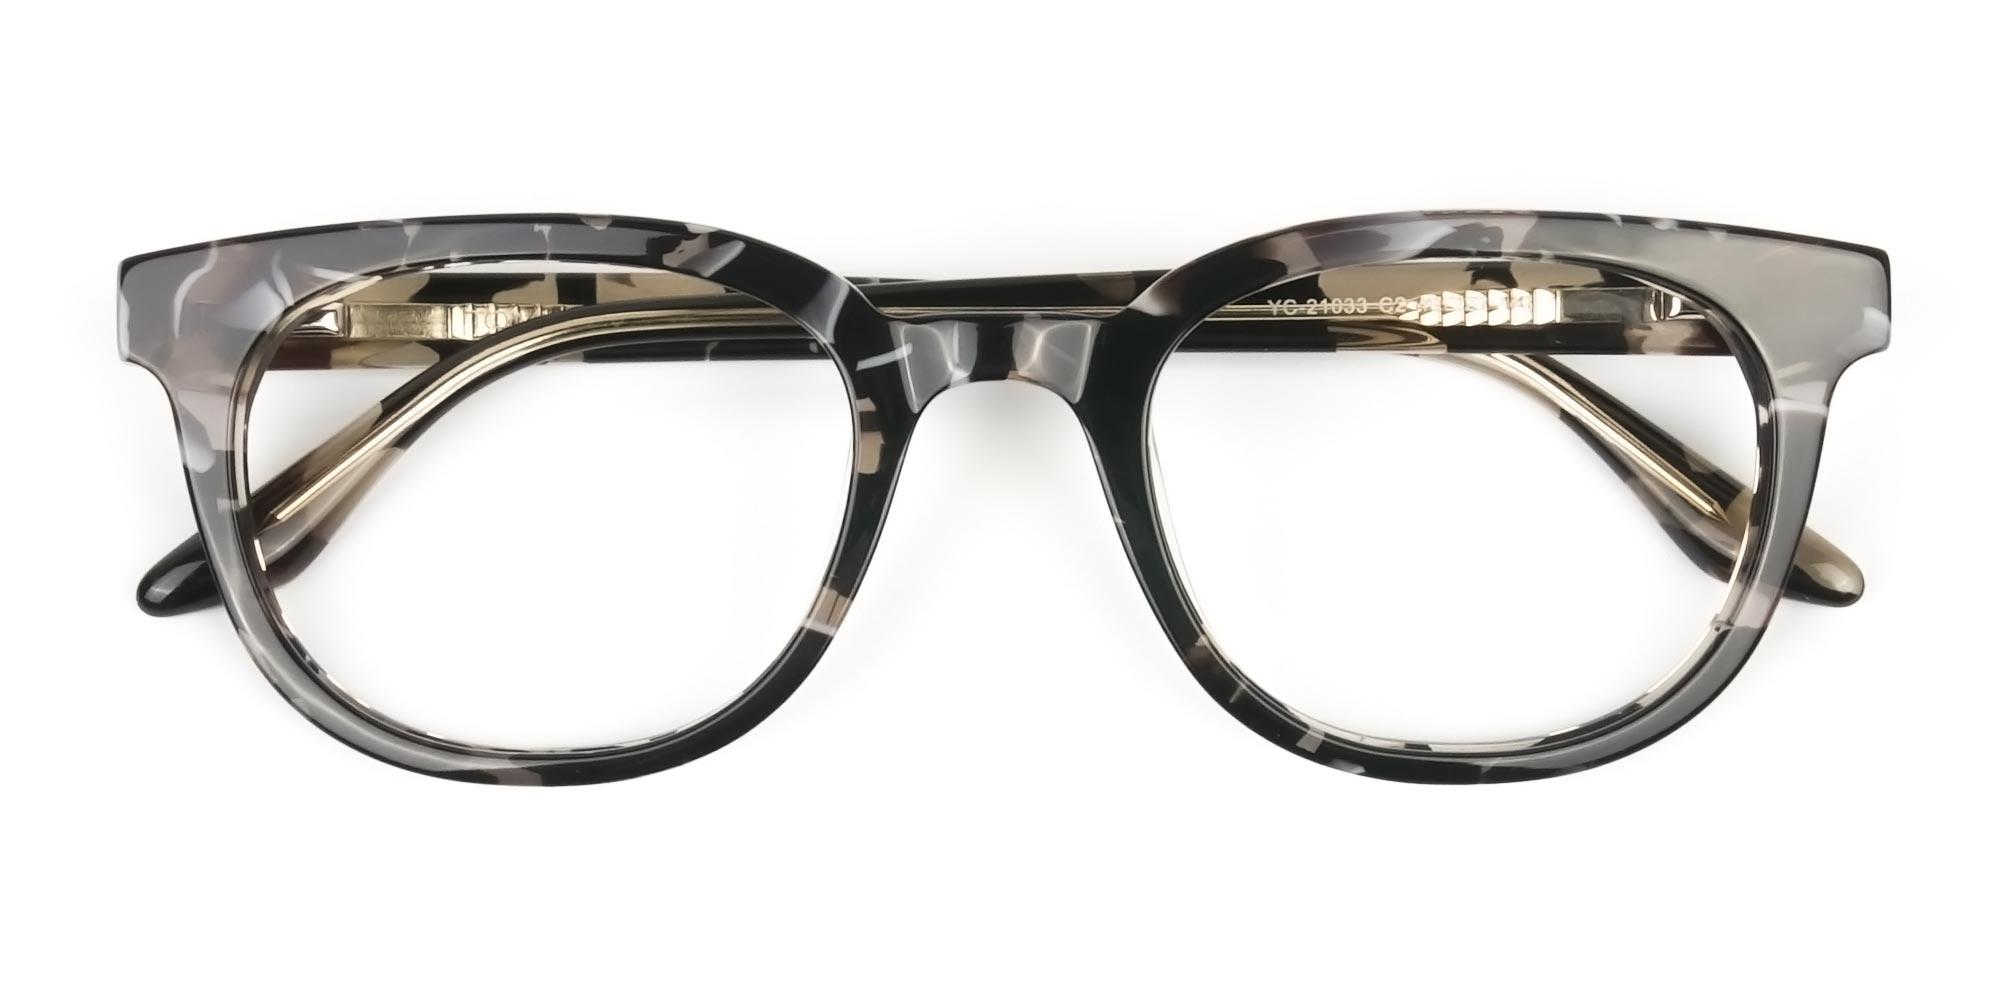 Hipster Thick Frame Camouflage Khaki Eyeglasses